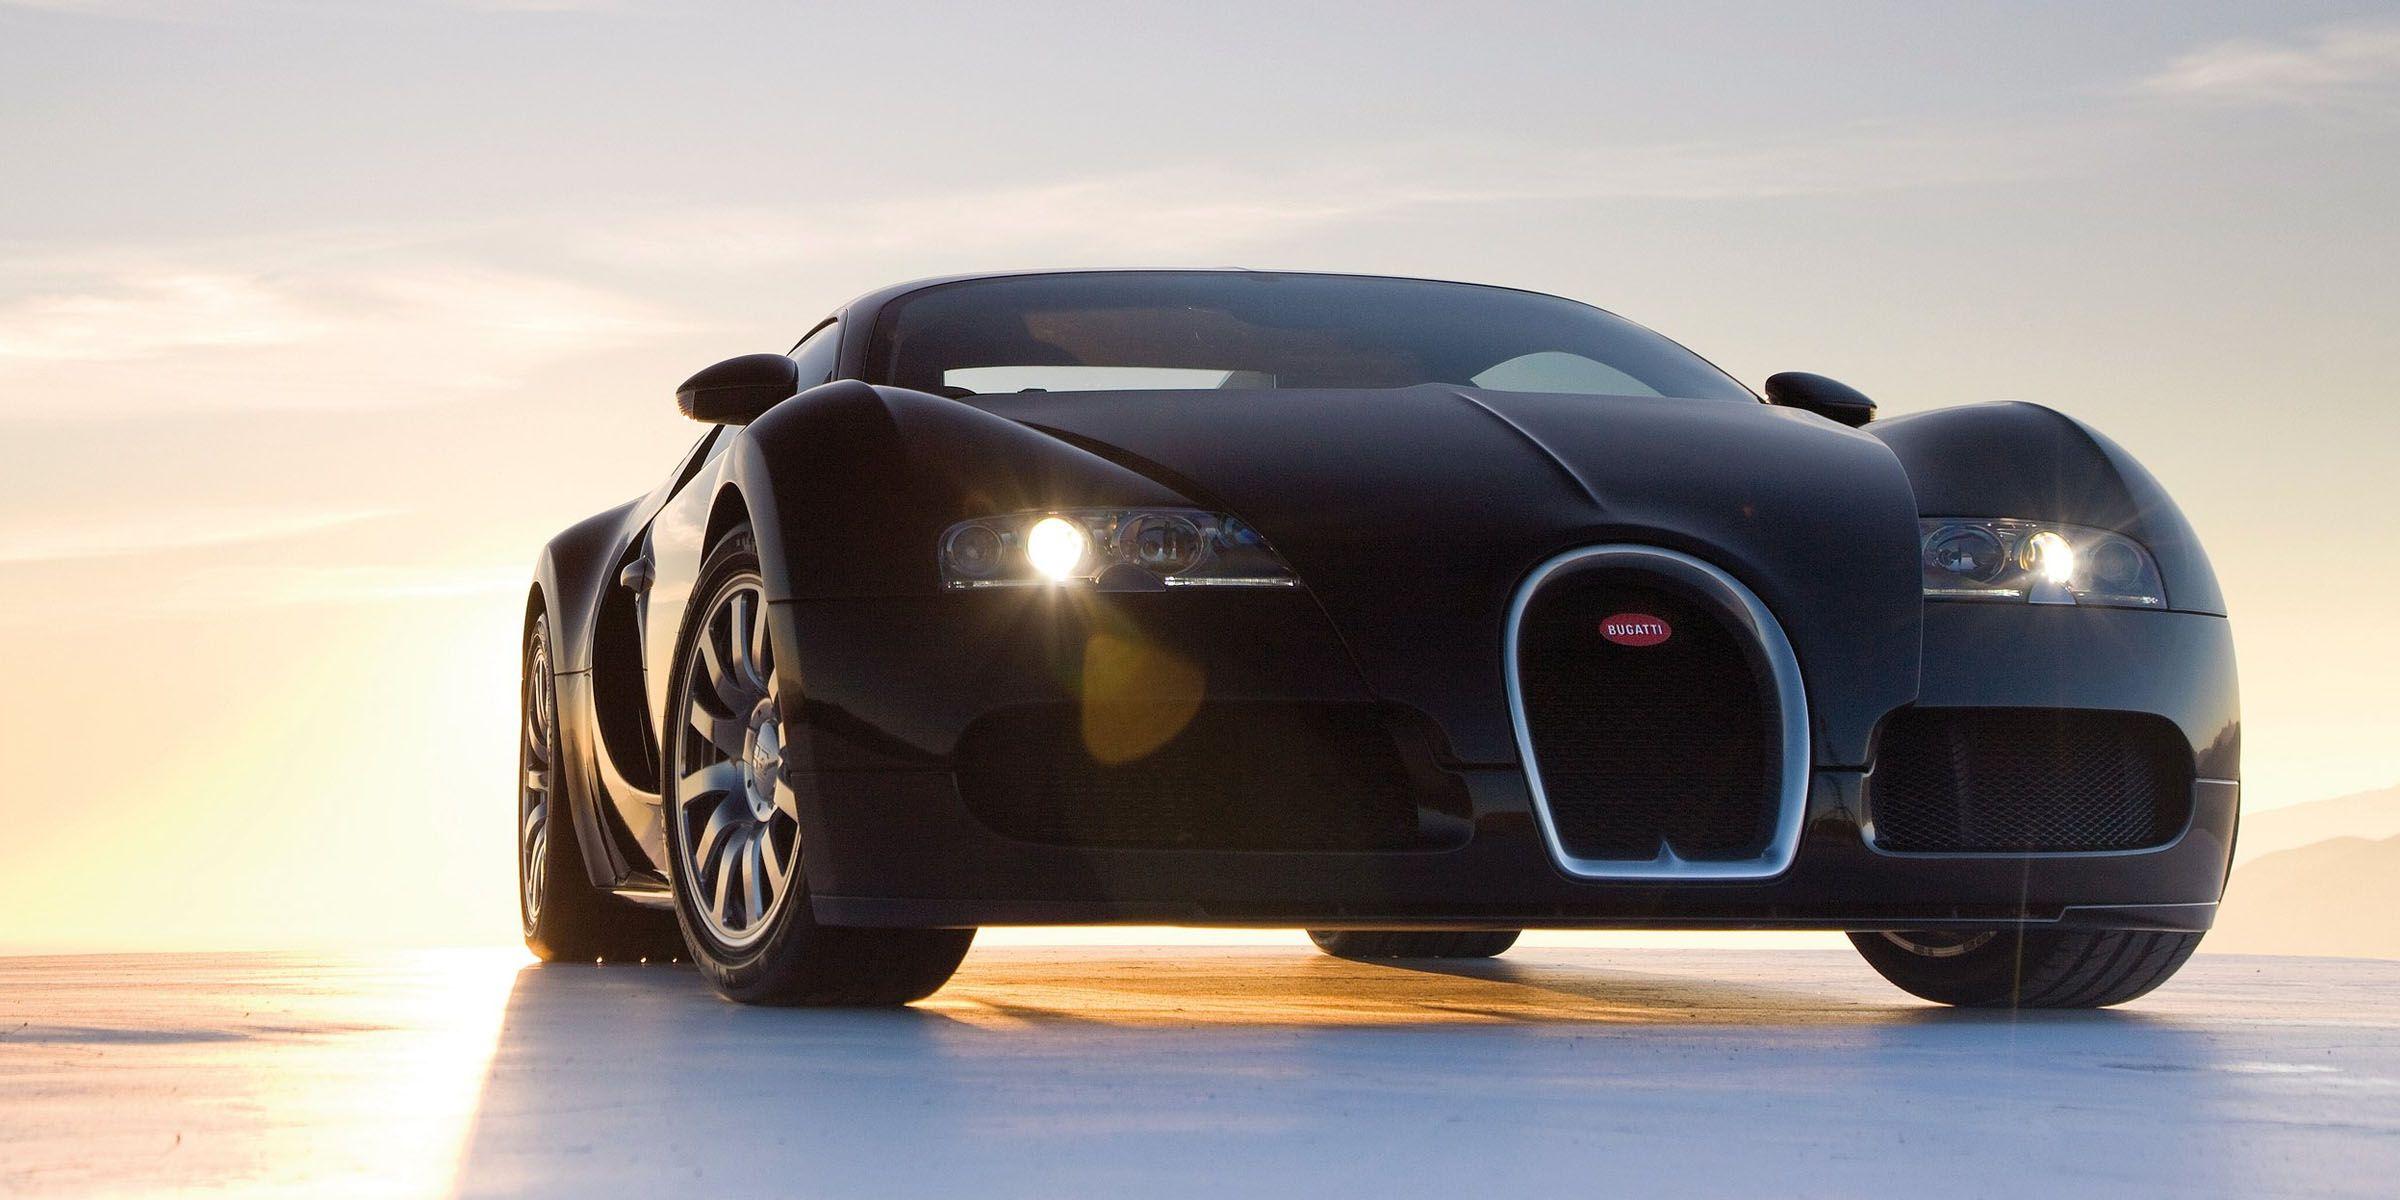 1426280459-bugatti-veyron-2009-black-sunset Cozy Bugatti Veyron W16 Engine Price Cars Trend